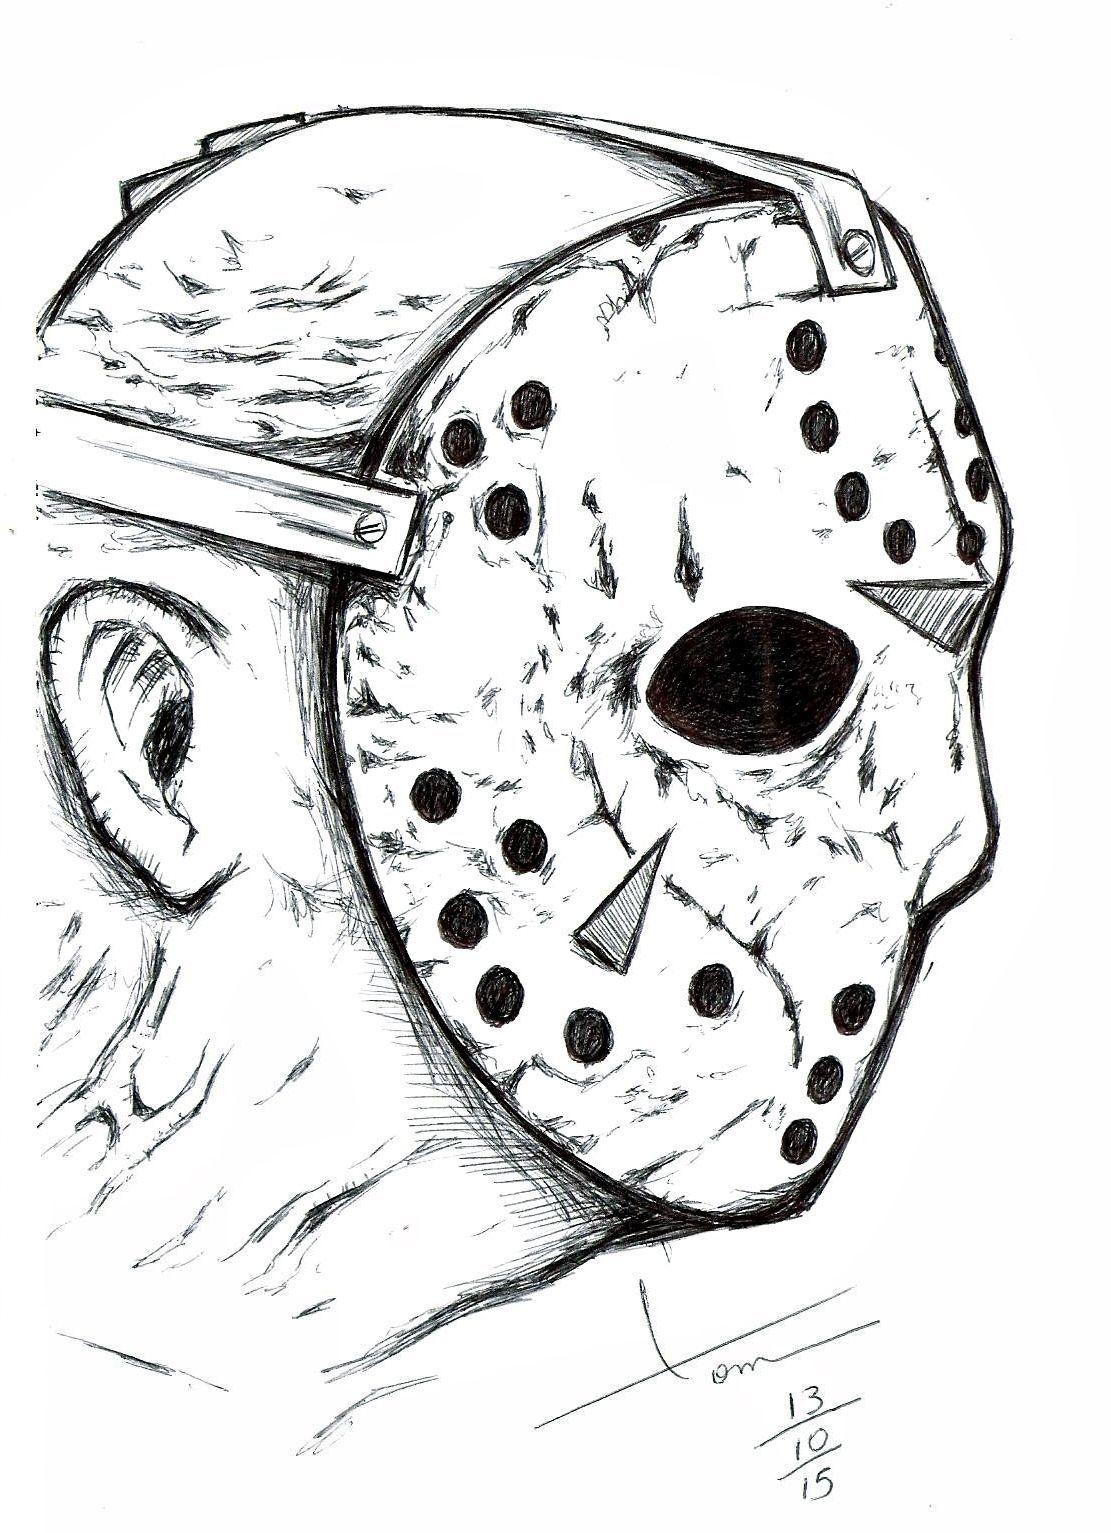 Halloween 2020 Ending Jason Voorhees jason sexta feira 13 desenhos de lapis desenhos a in 2020 | Friday